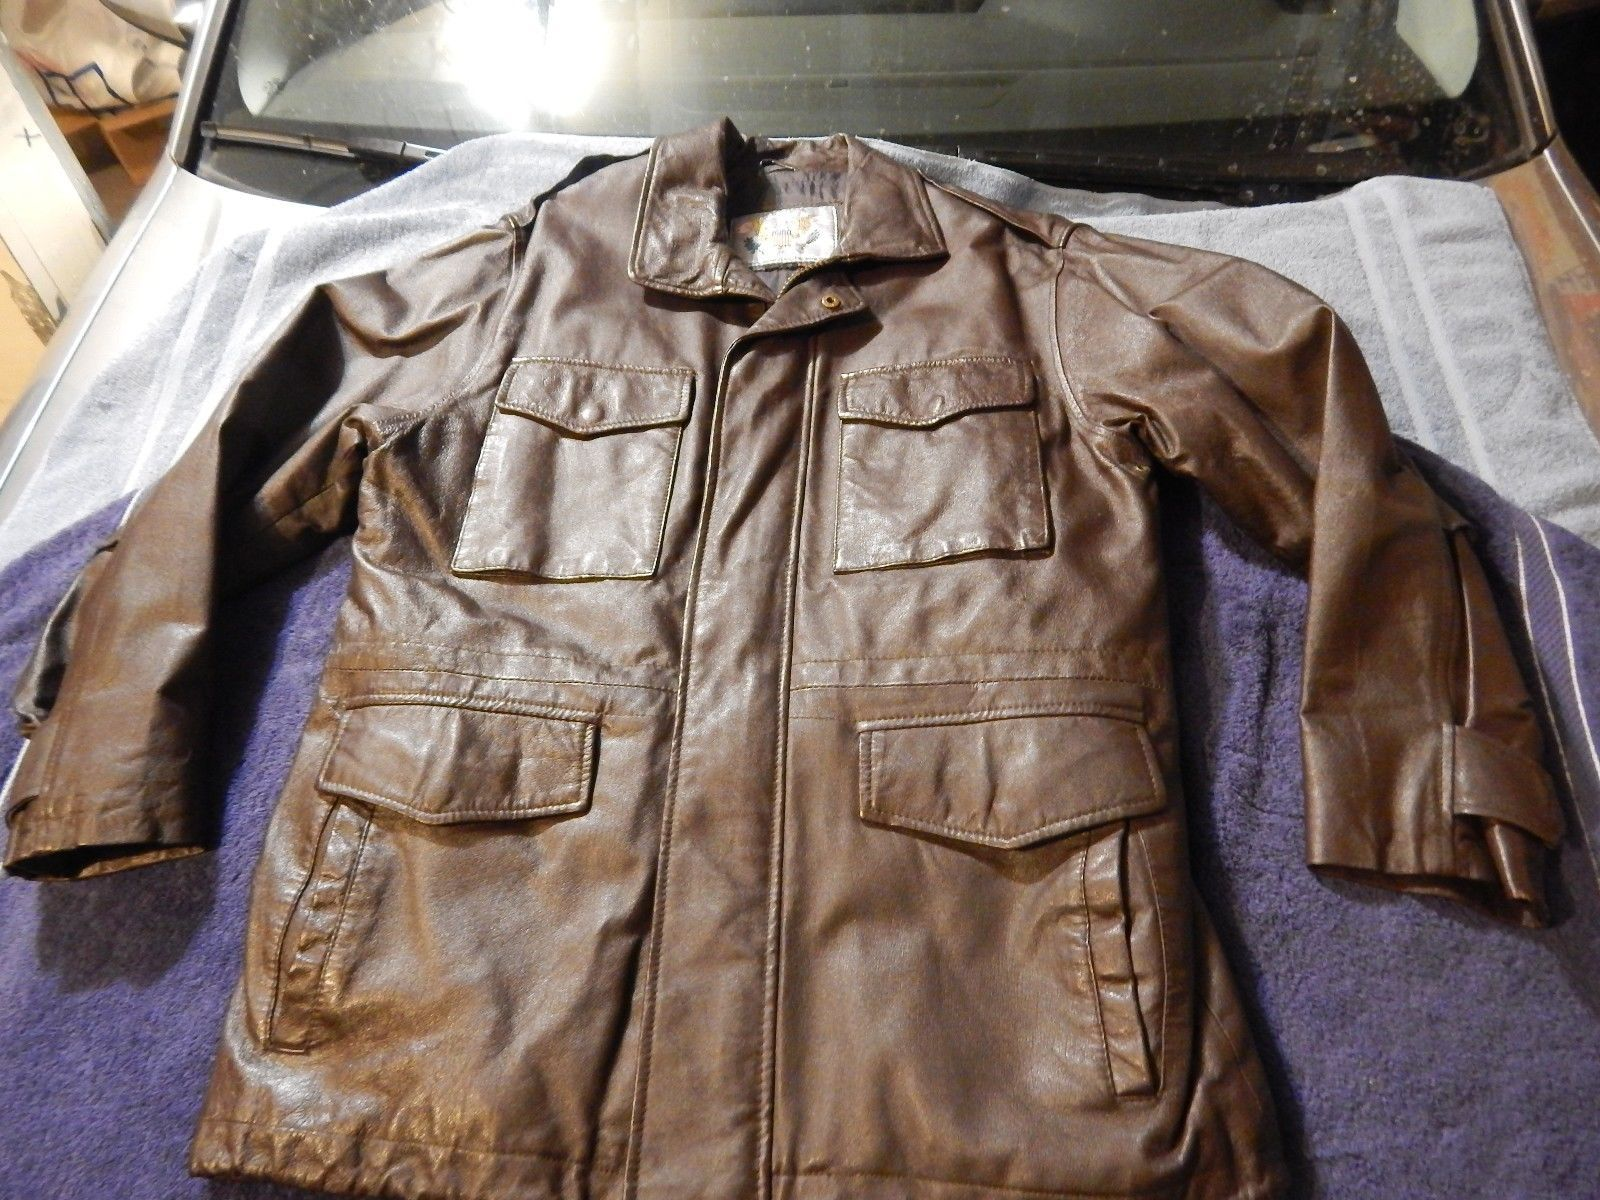 Men's Cooper Genuine Leather US Army Field Multi Pocket Brown Jacket Size M https://t.co/8ZJA3veNsR https://t.co/RsXsTXNj6o